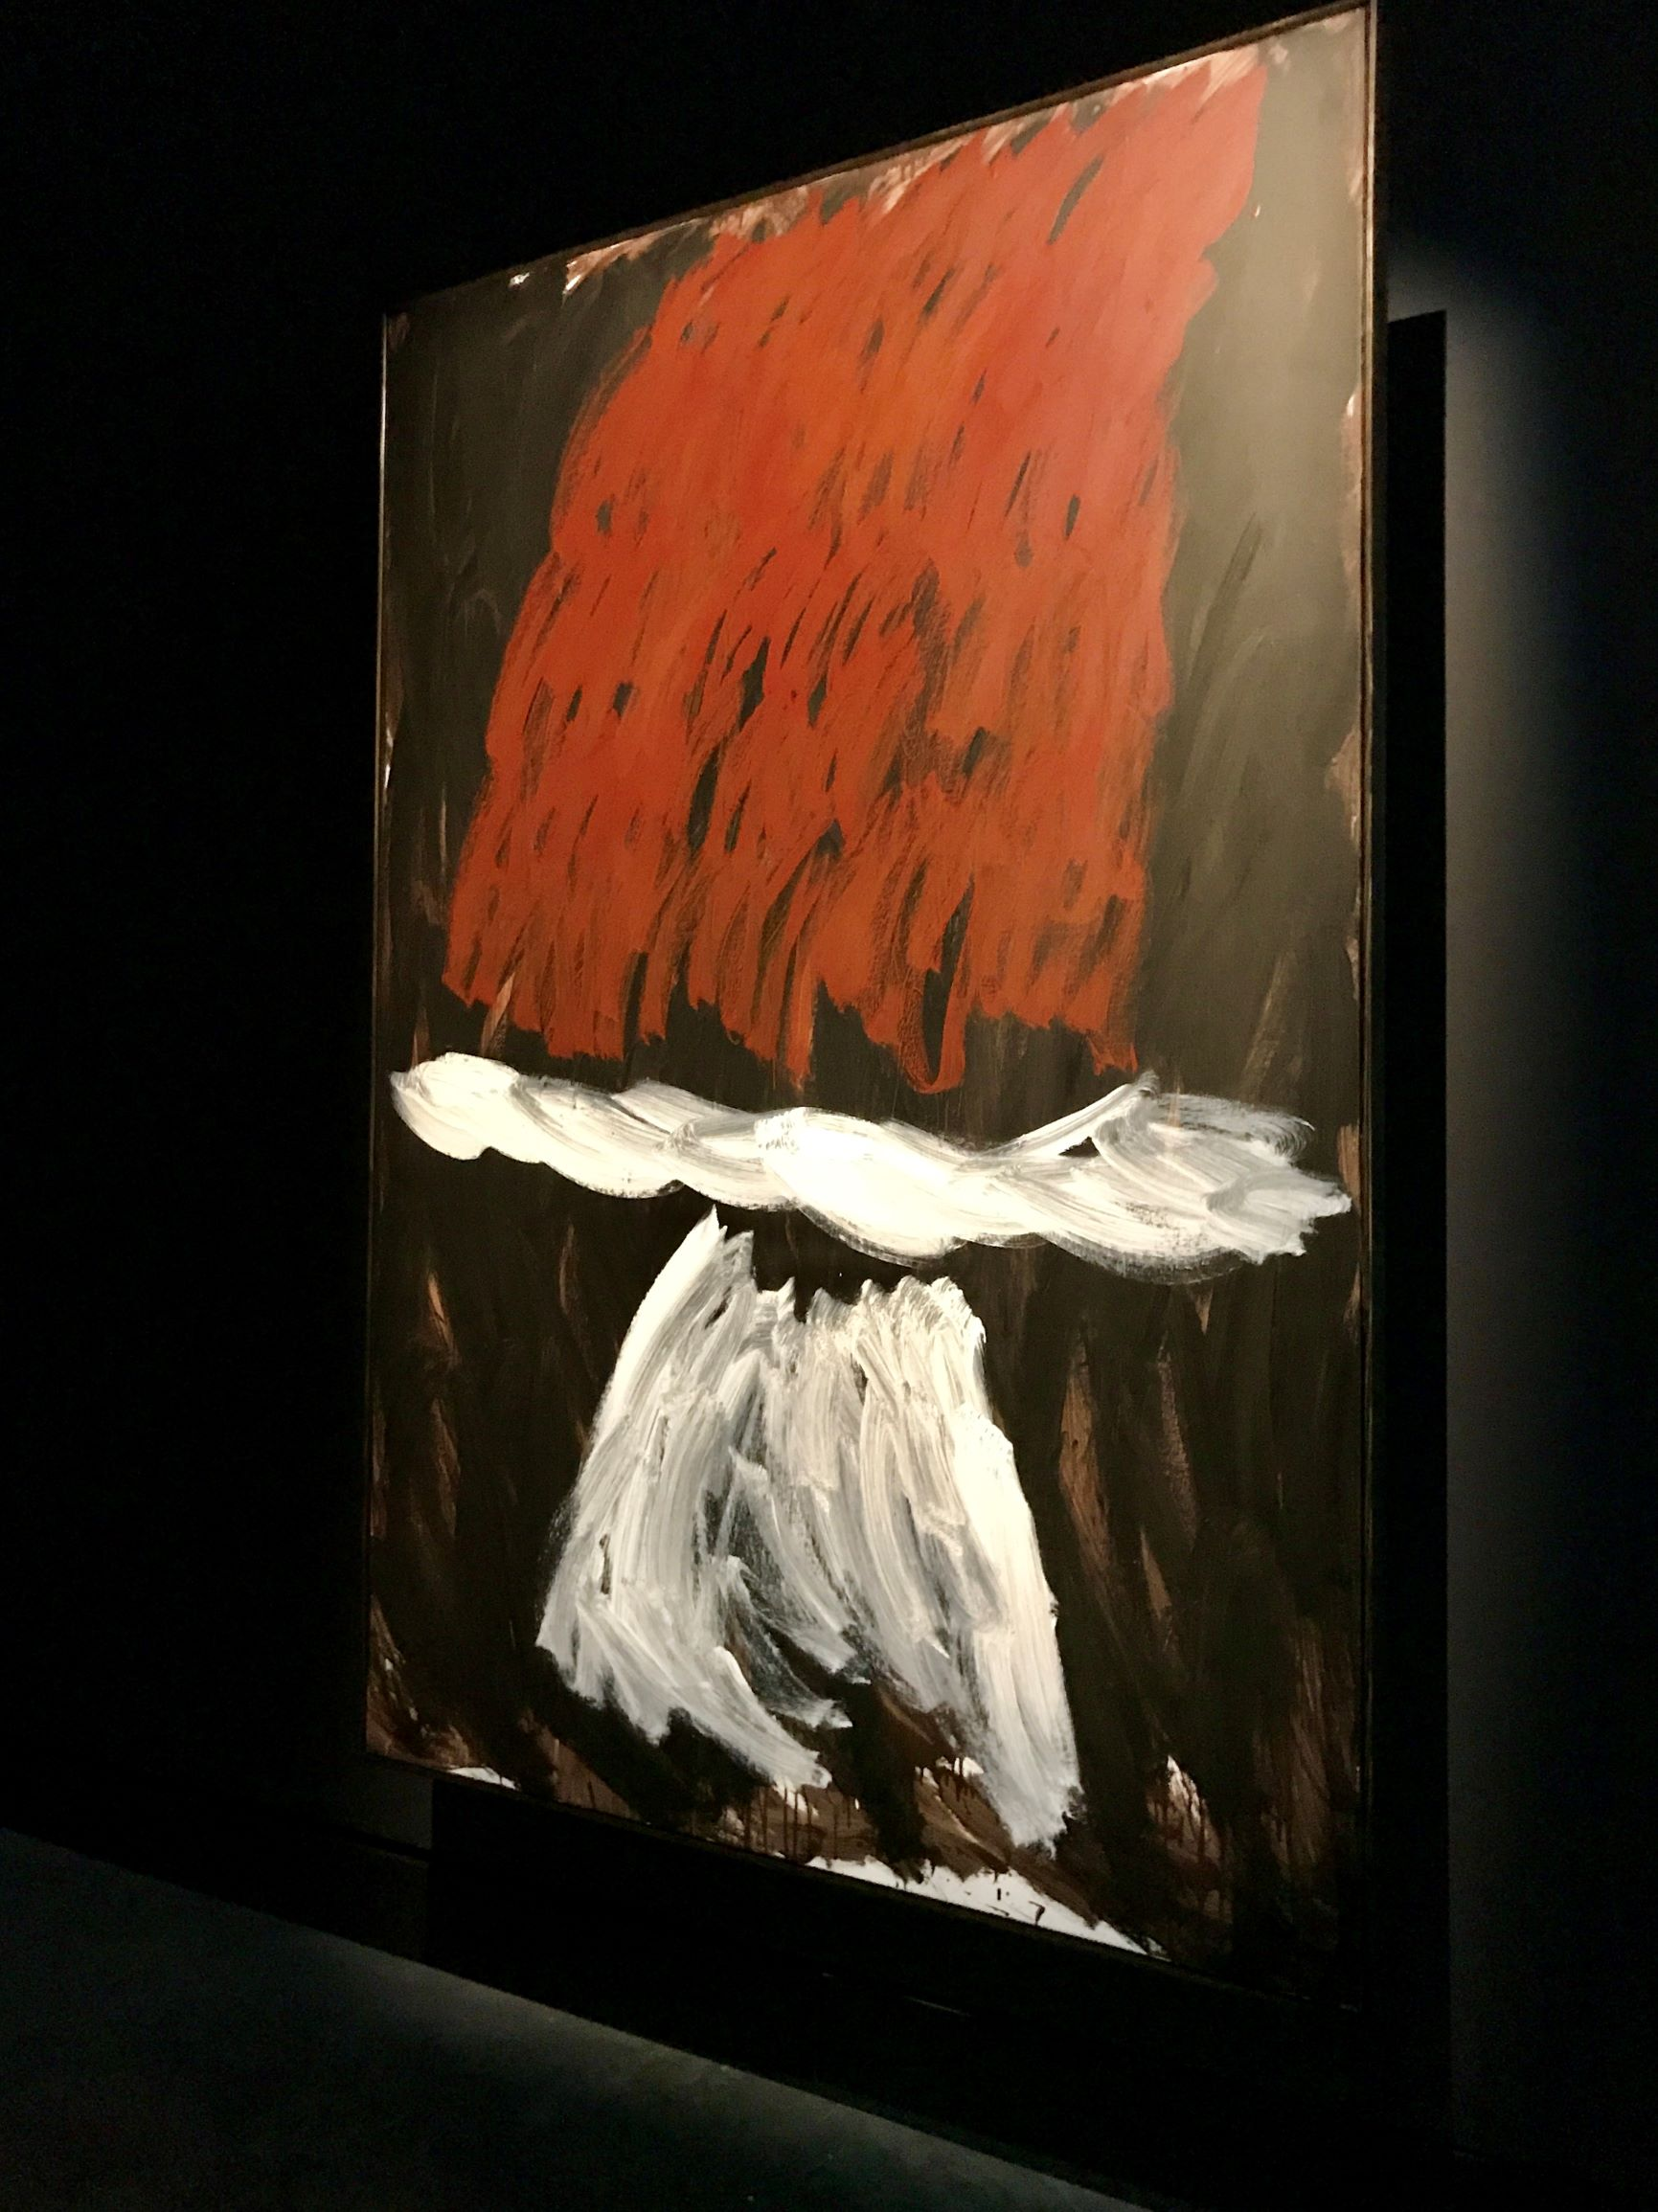 Lottie Consalvo, Mailtland Regional Art Gallery